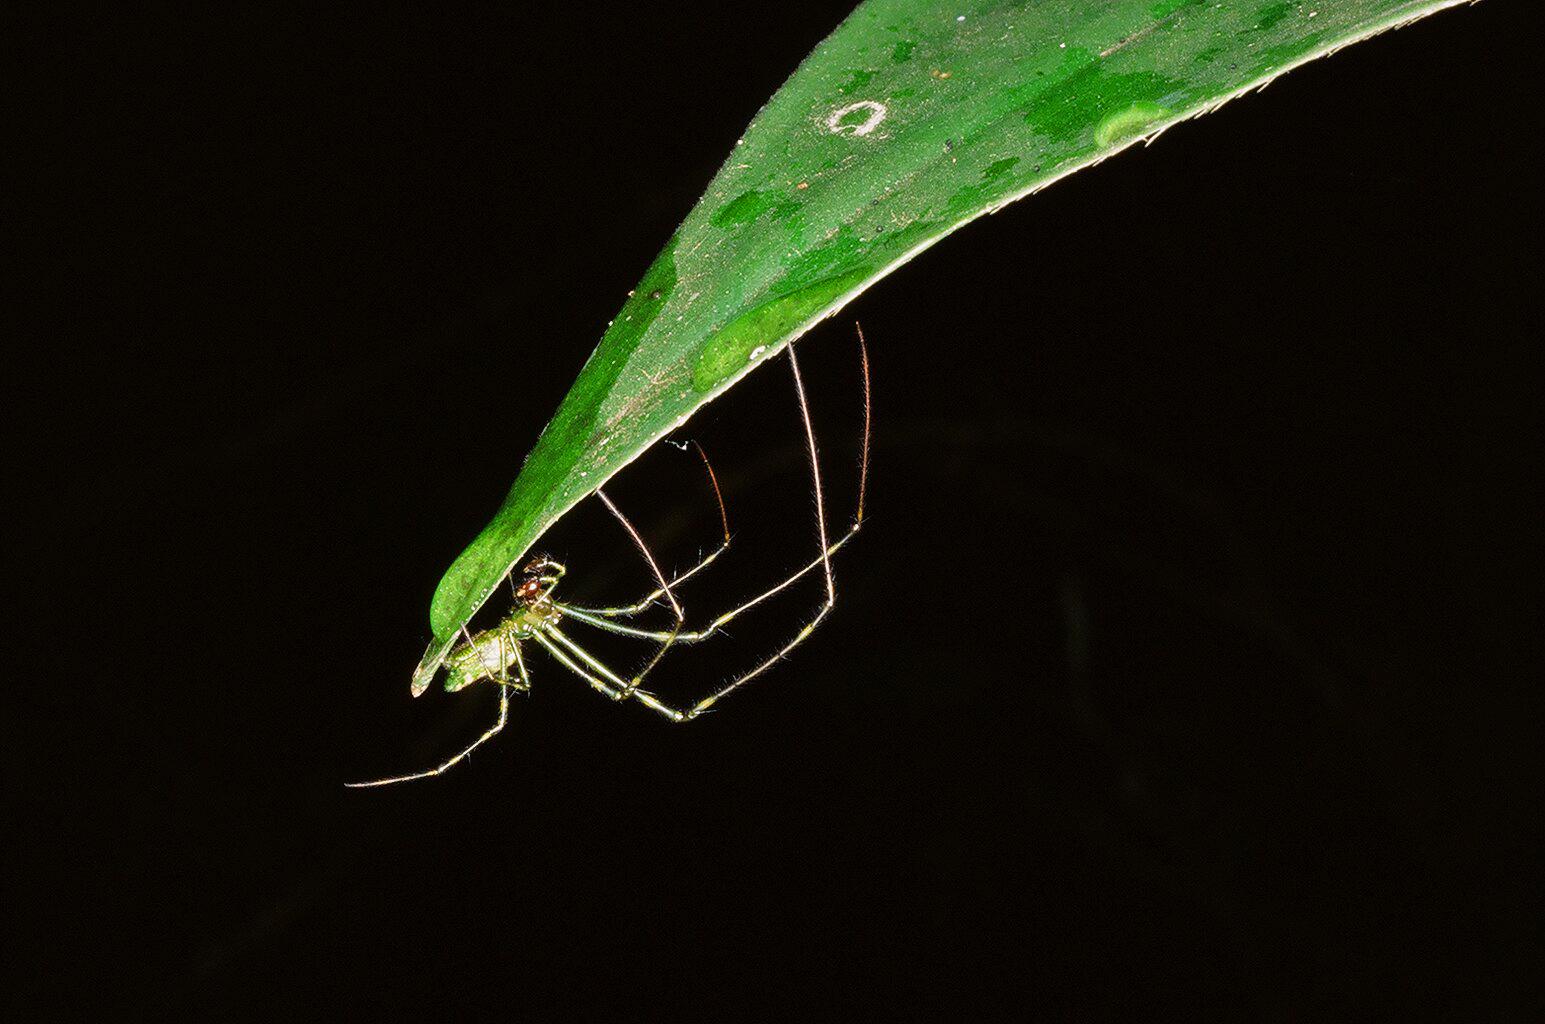 NURSERY WEB SPIDER (Pisauridae)